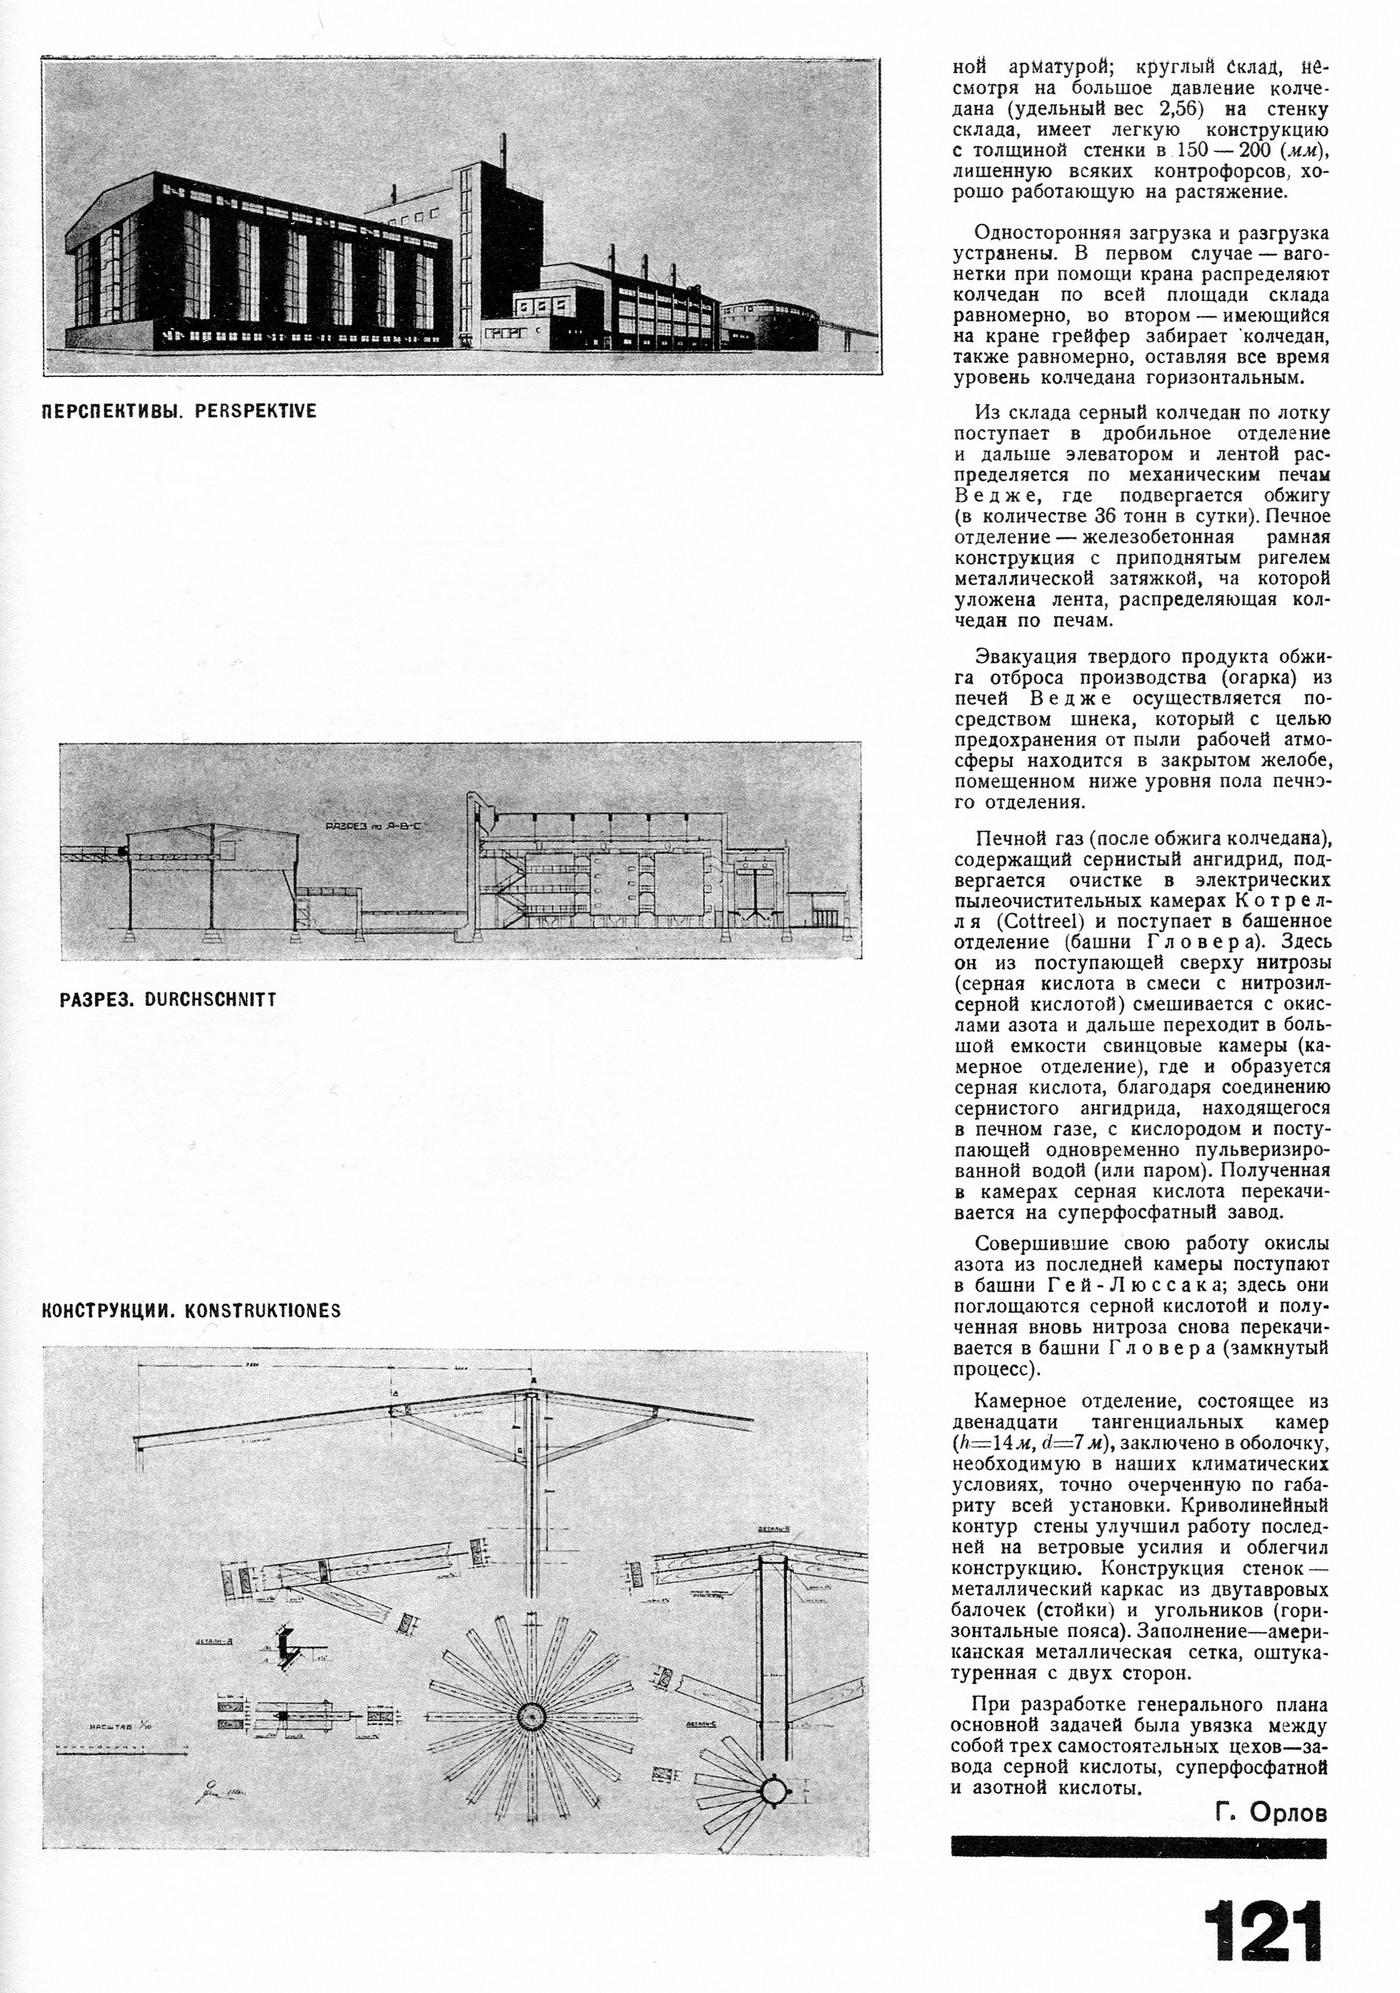 tehne.com-sa-1926-5-6-1400-0013